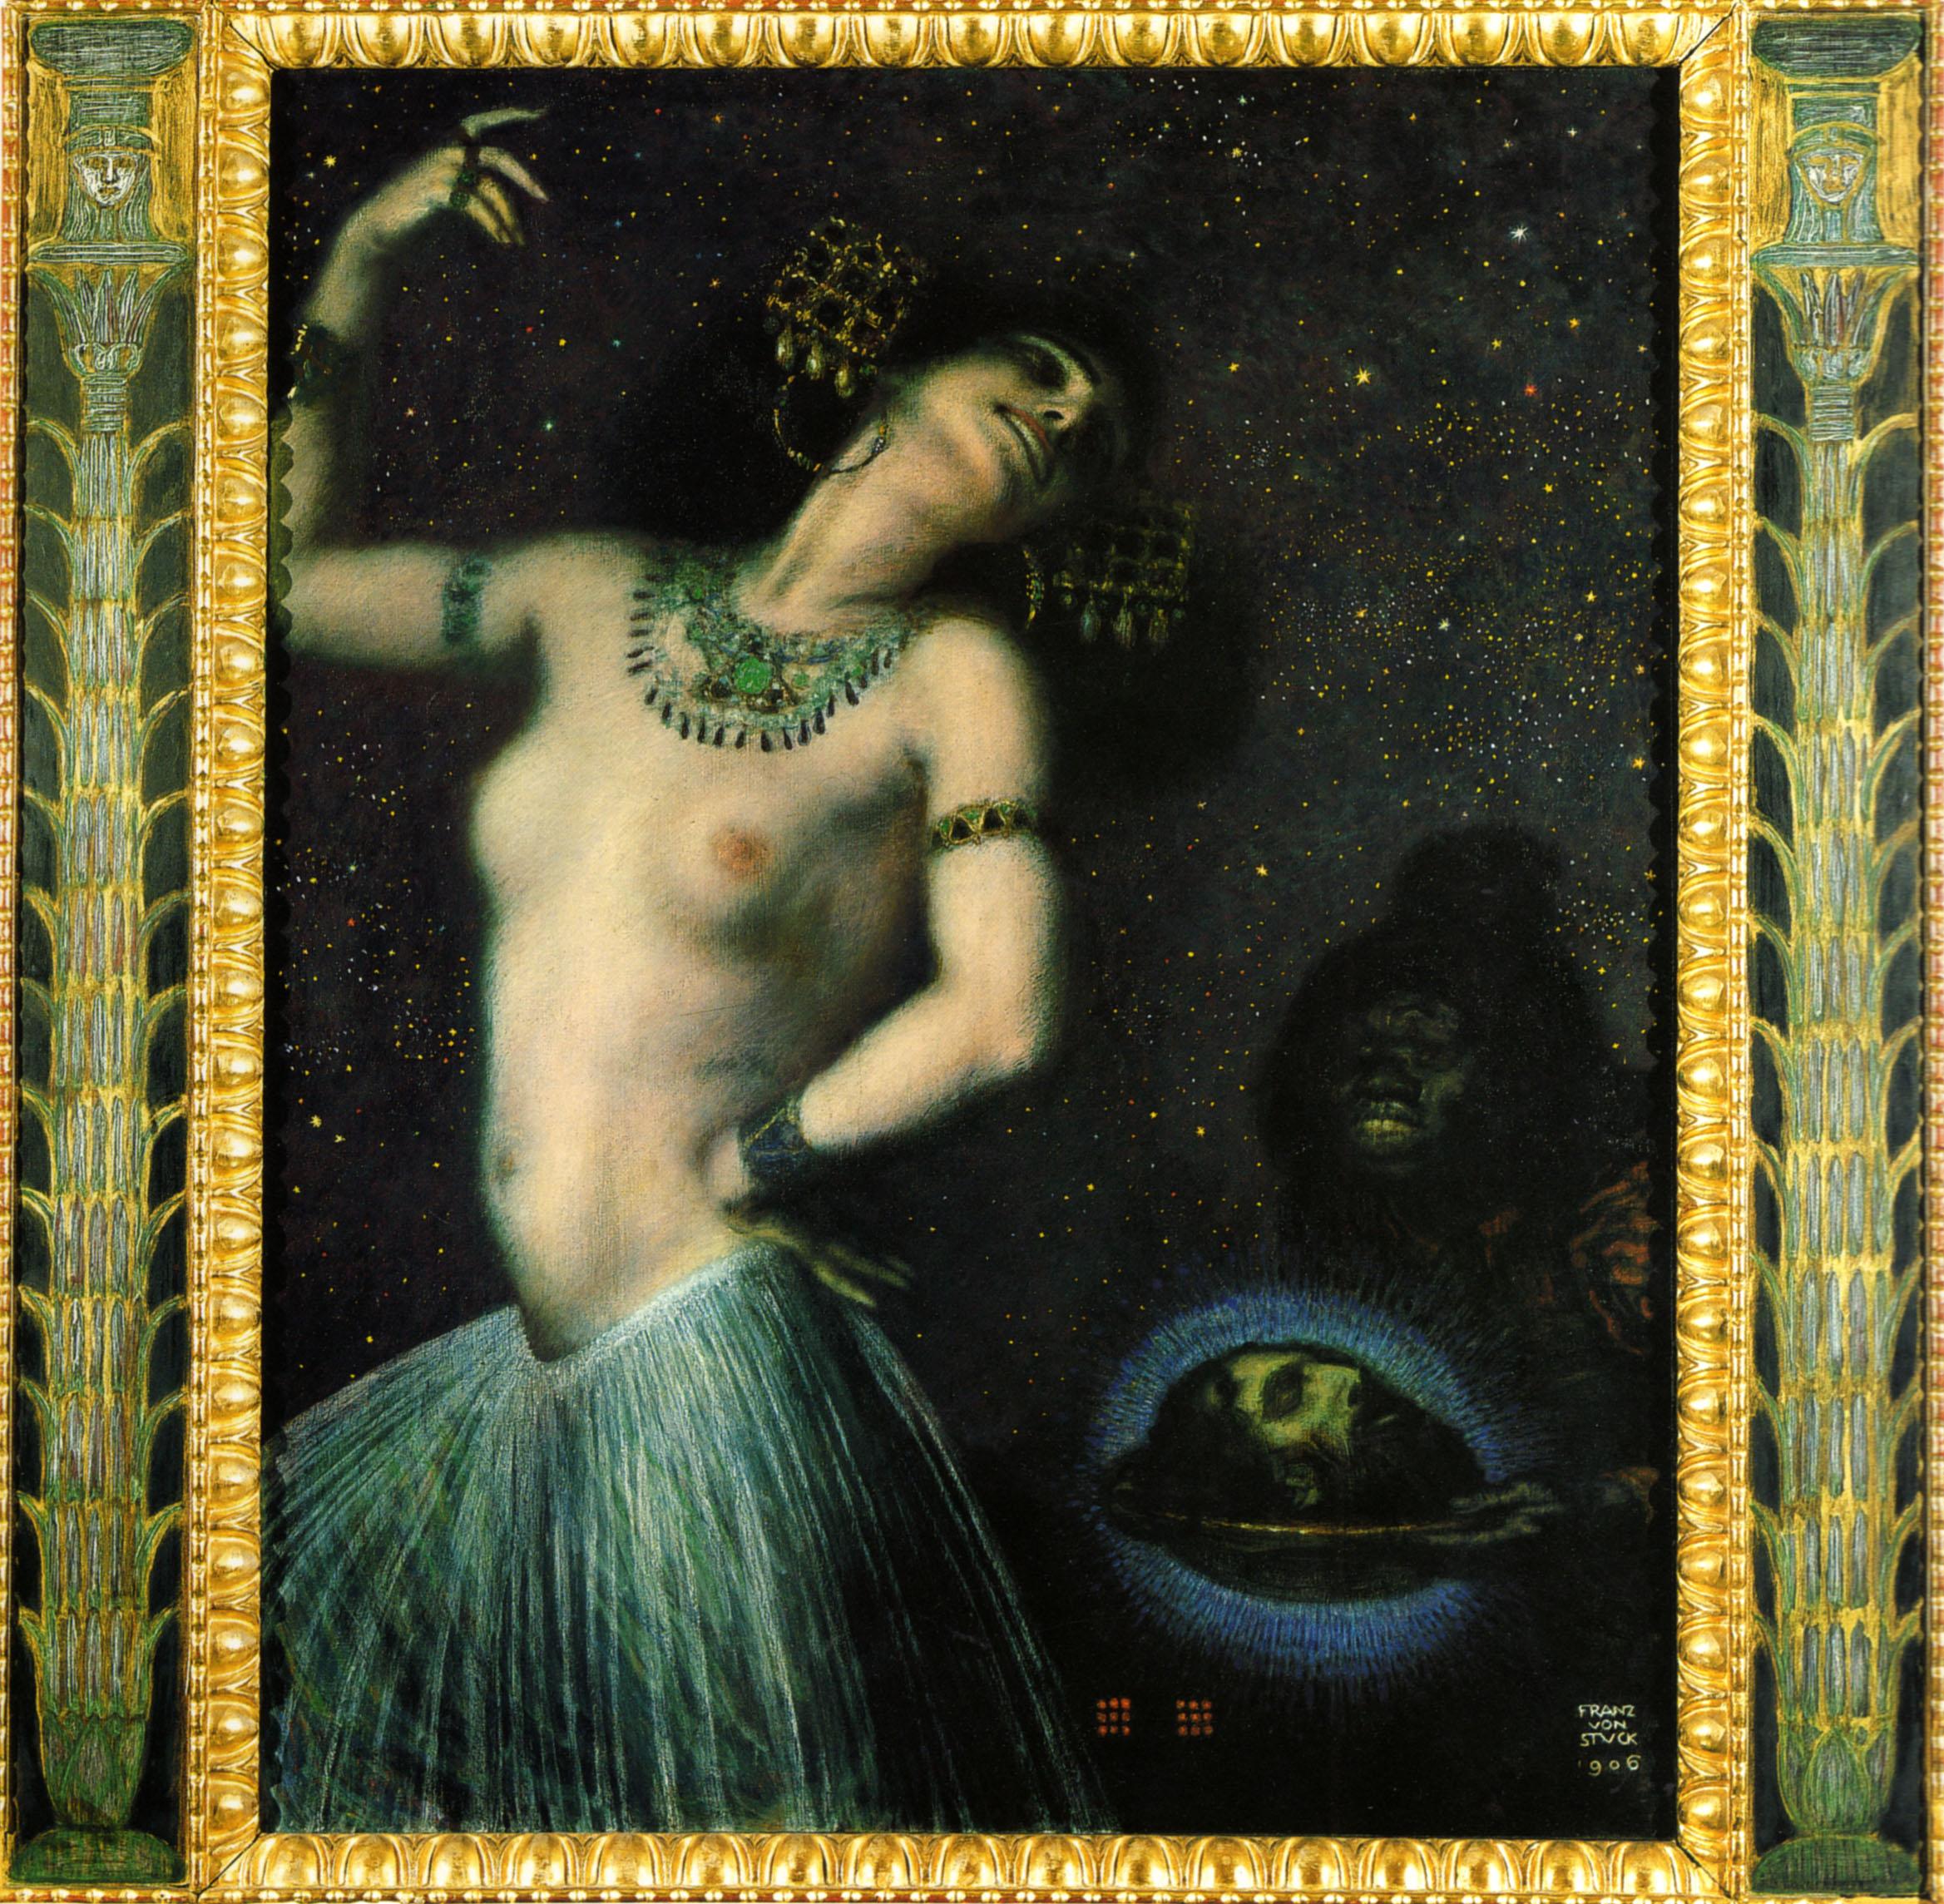 """Саломея"" — картина работы Франца фон Штука"